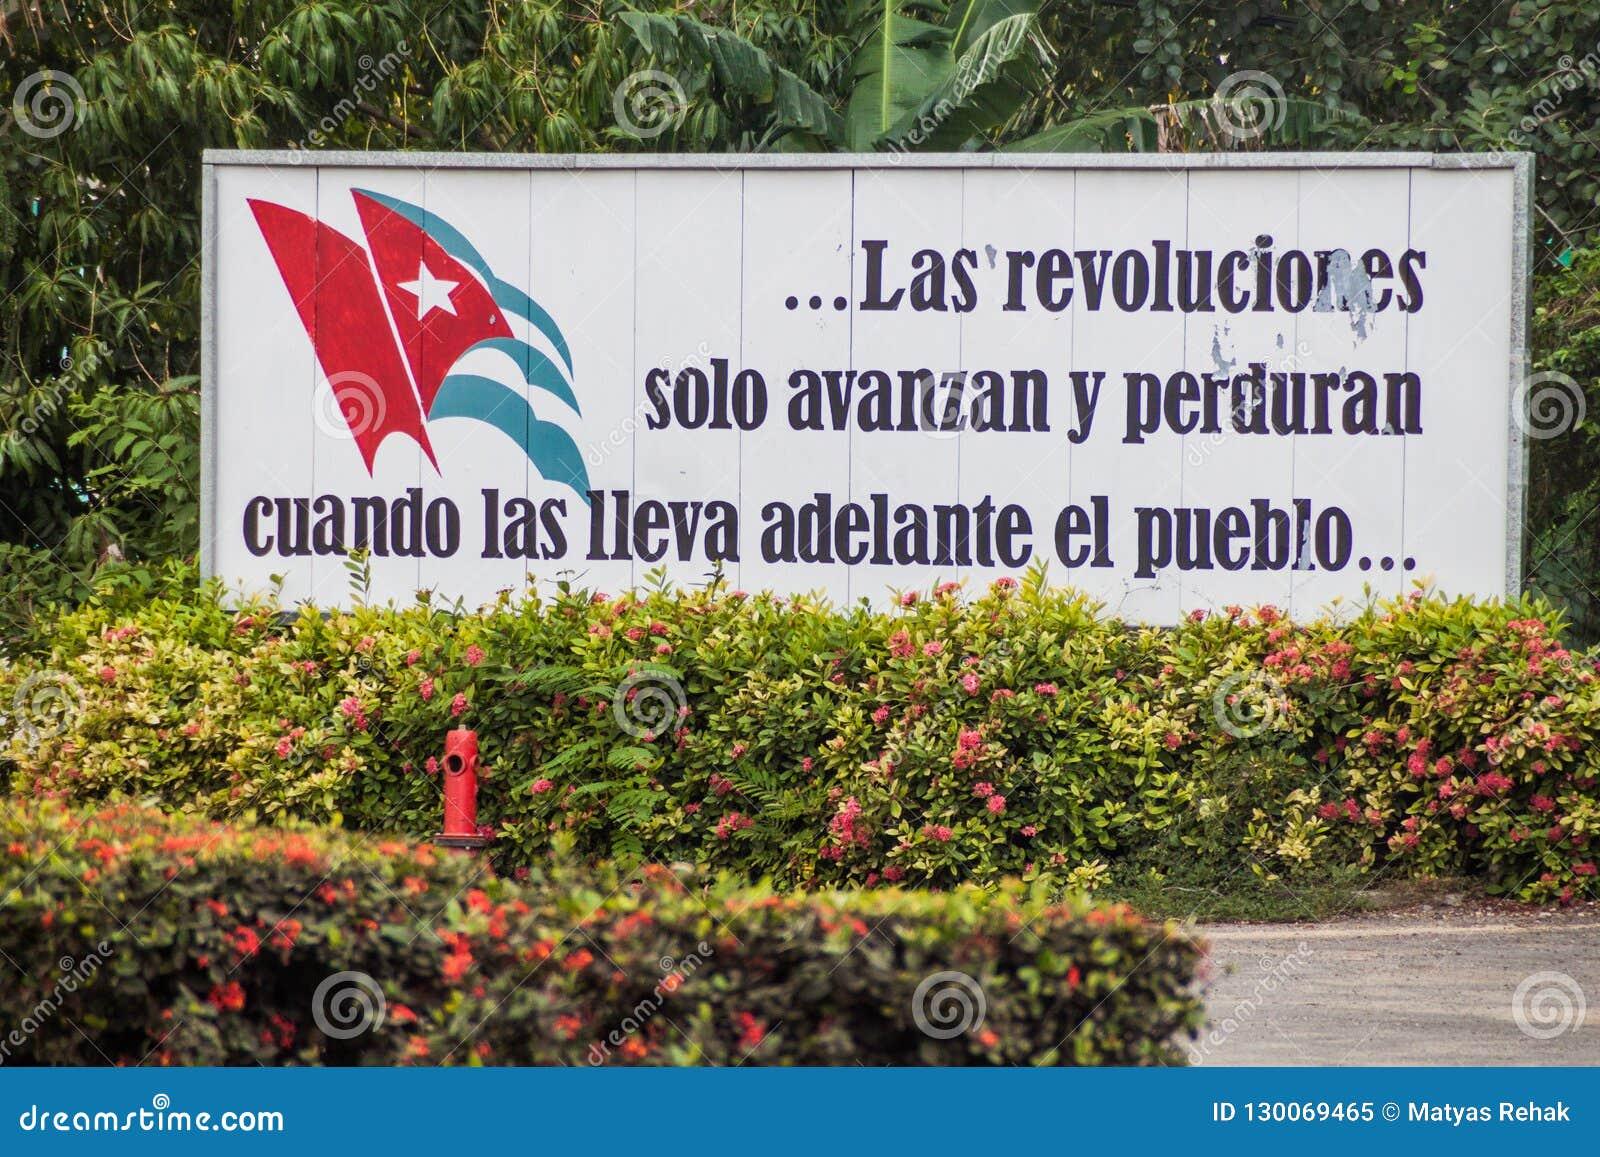 LAS TUNAS, CUBA - JAN 27, 2016: Propaganda billboard at Plaza de la Revolucion Square of the Revolution in Las Tunas